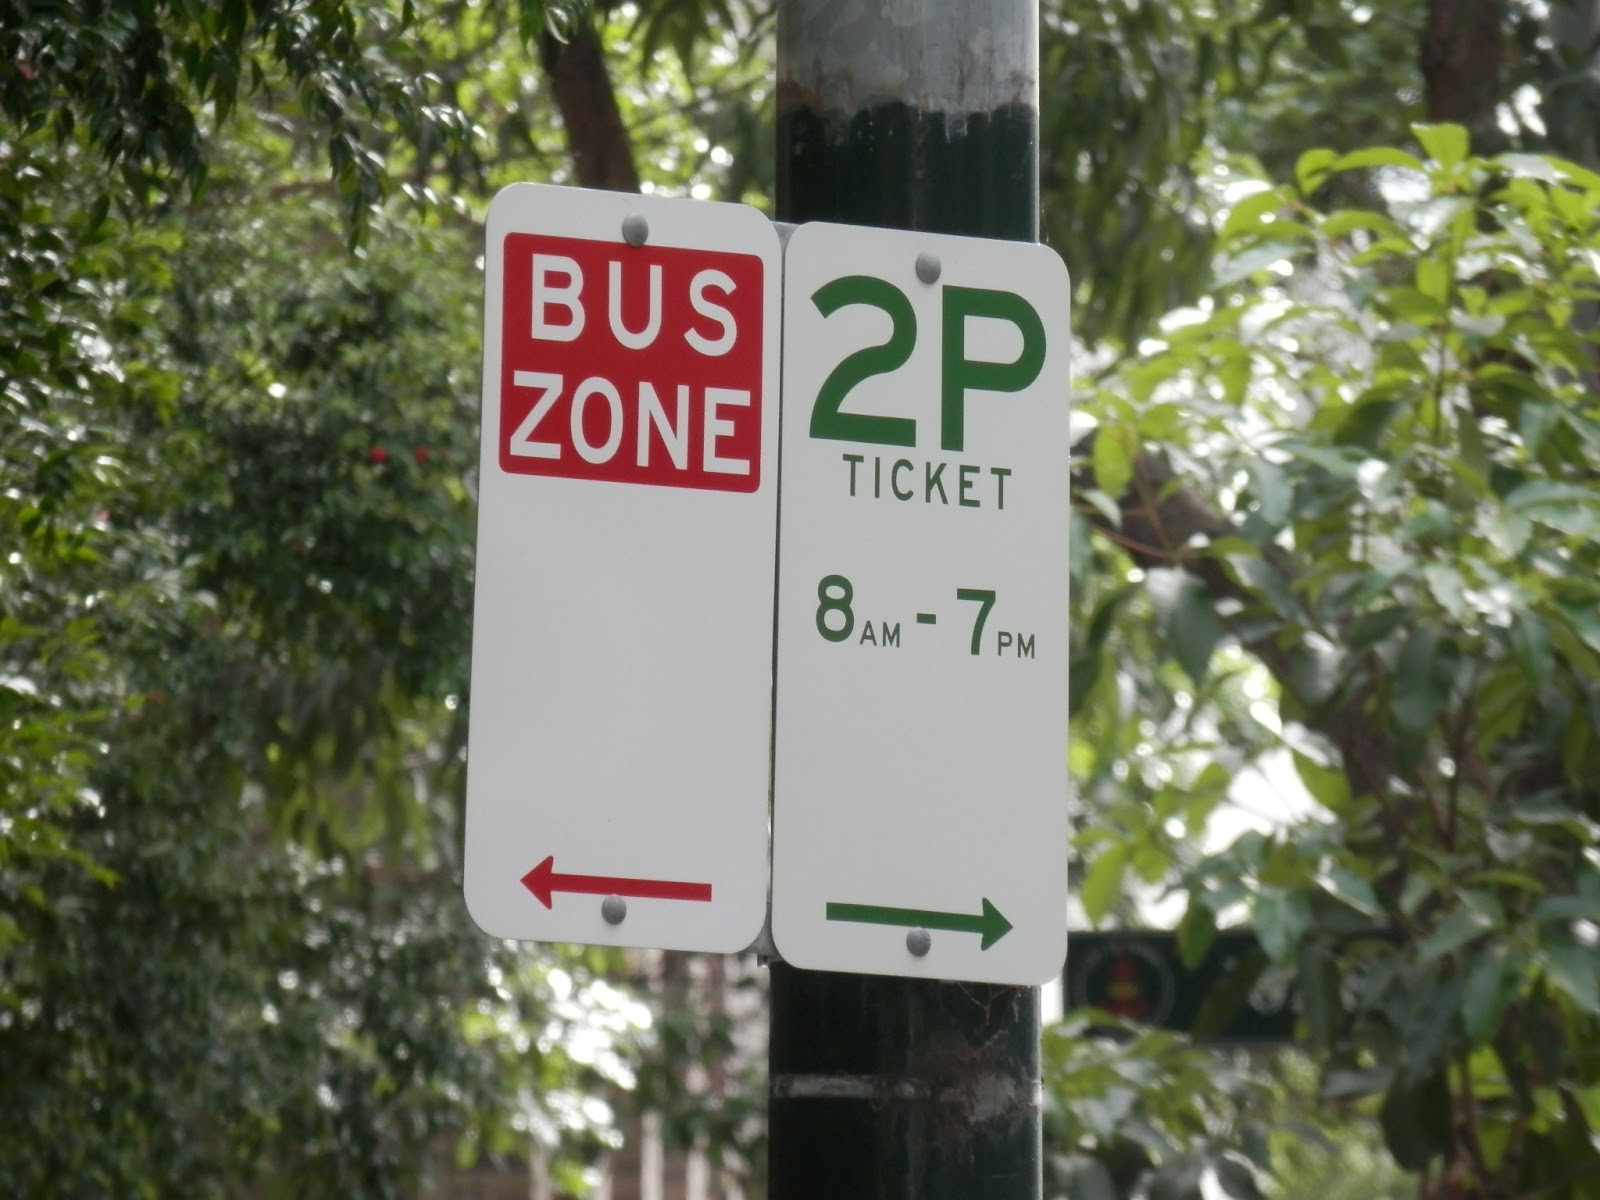 zone 3 bus ticket sydney - photo#15